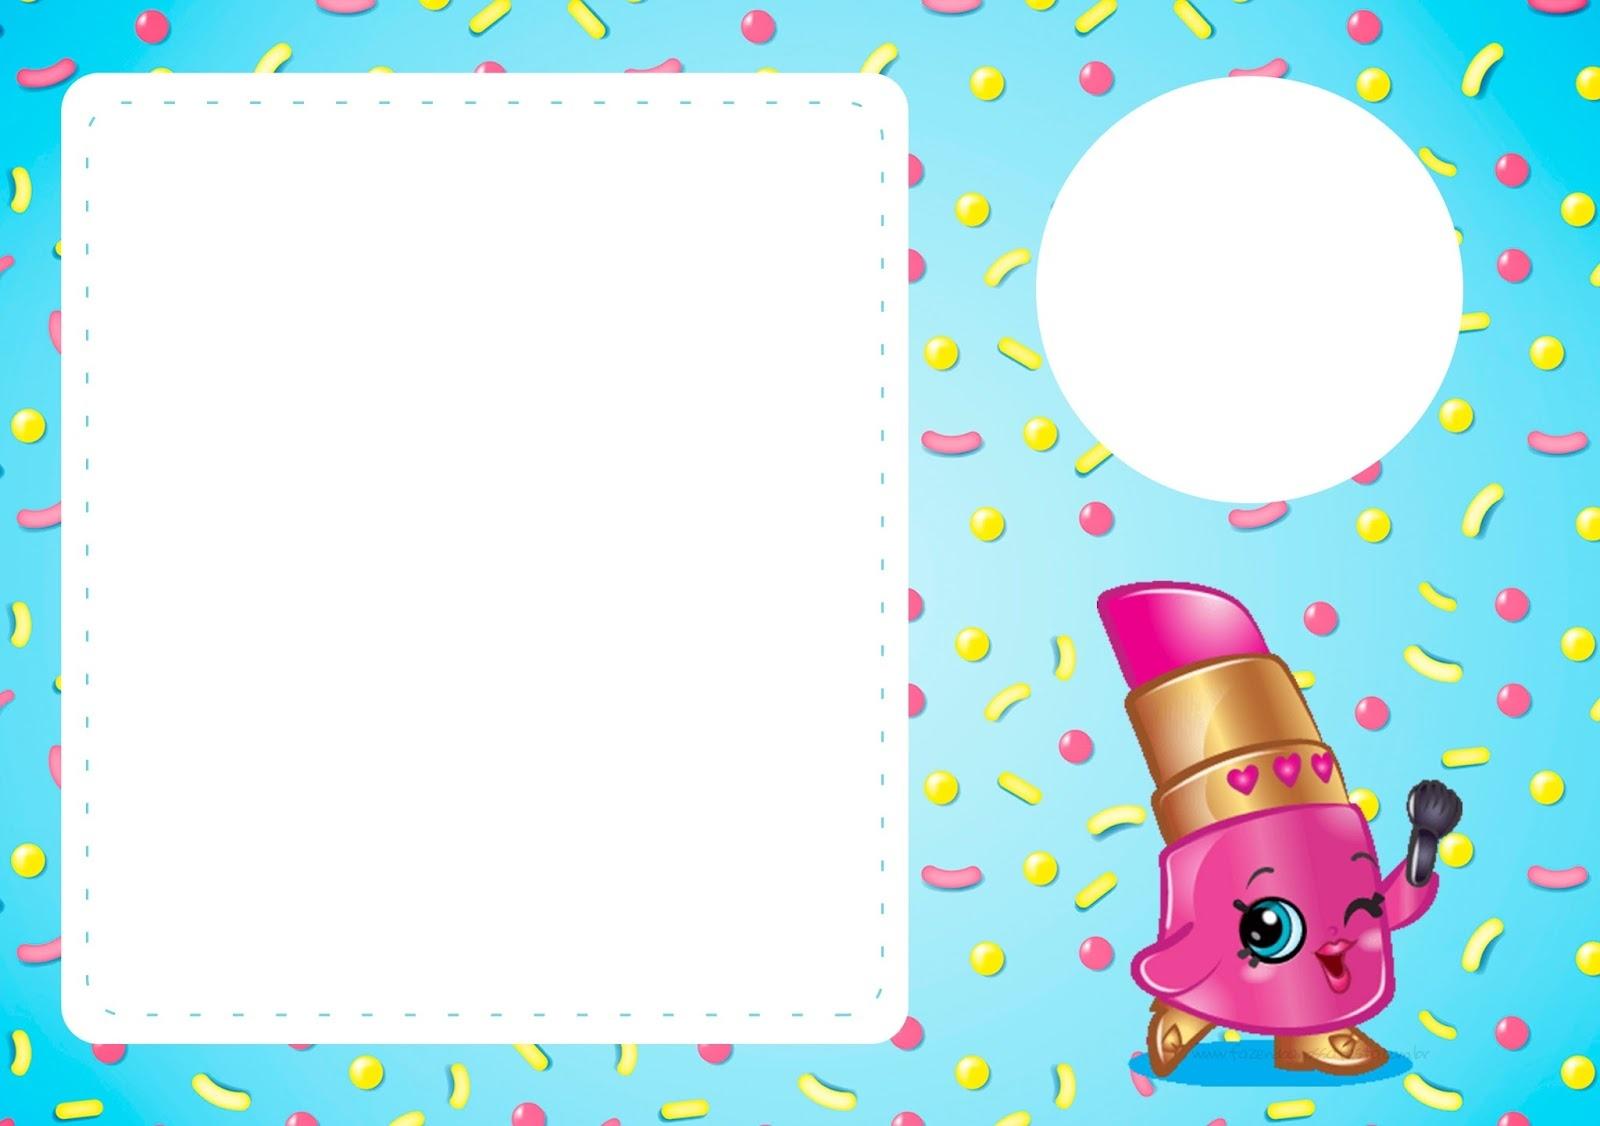 Shopkins: Free Printable Invitations. - Oh My Fiesta! In English - Free Printable Invitations